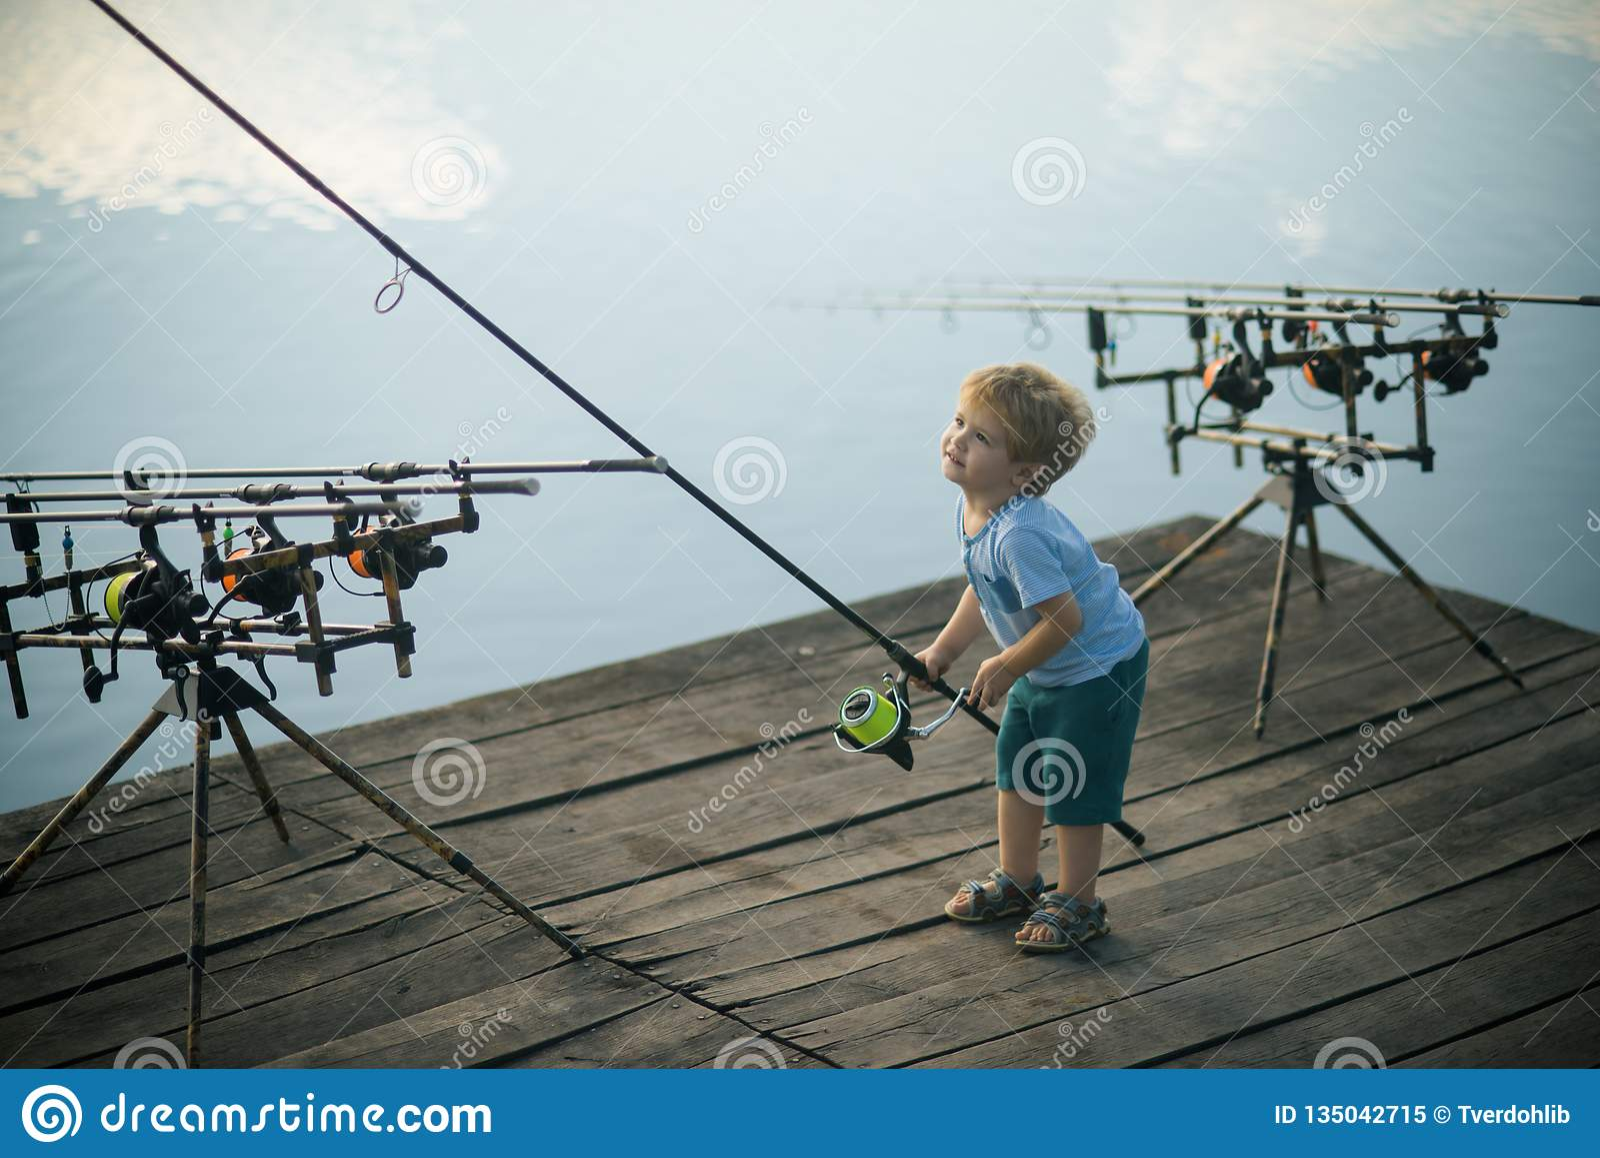 Fishing, angling, activity, adventure, sport